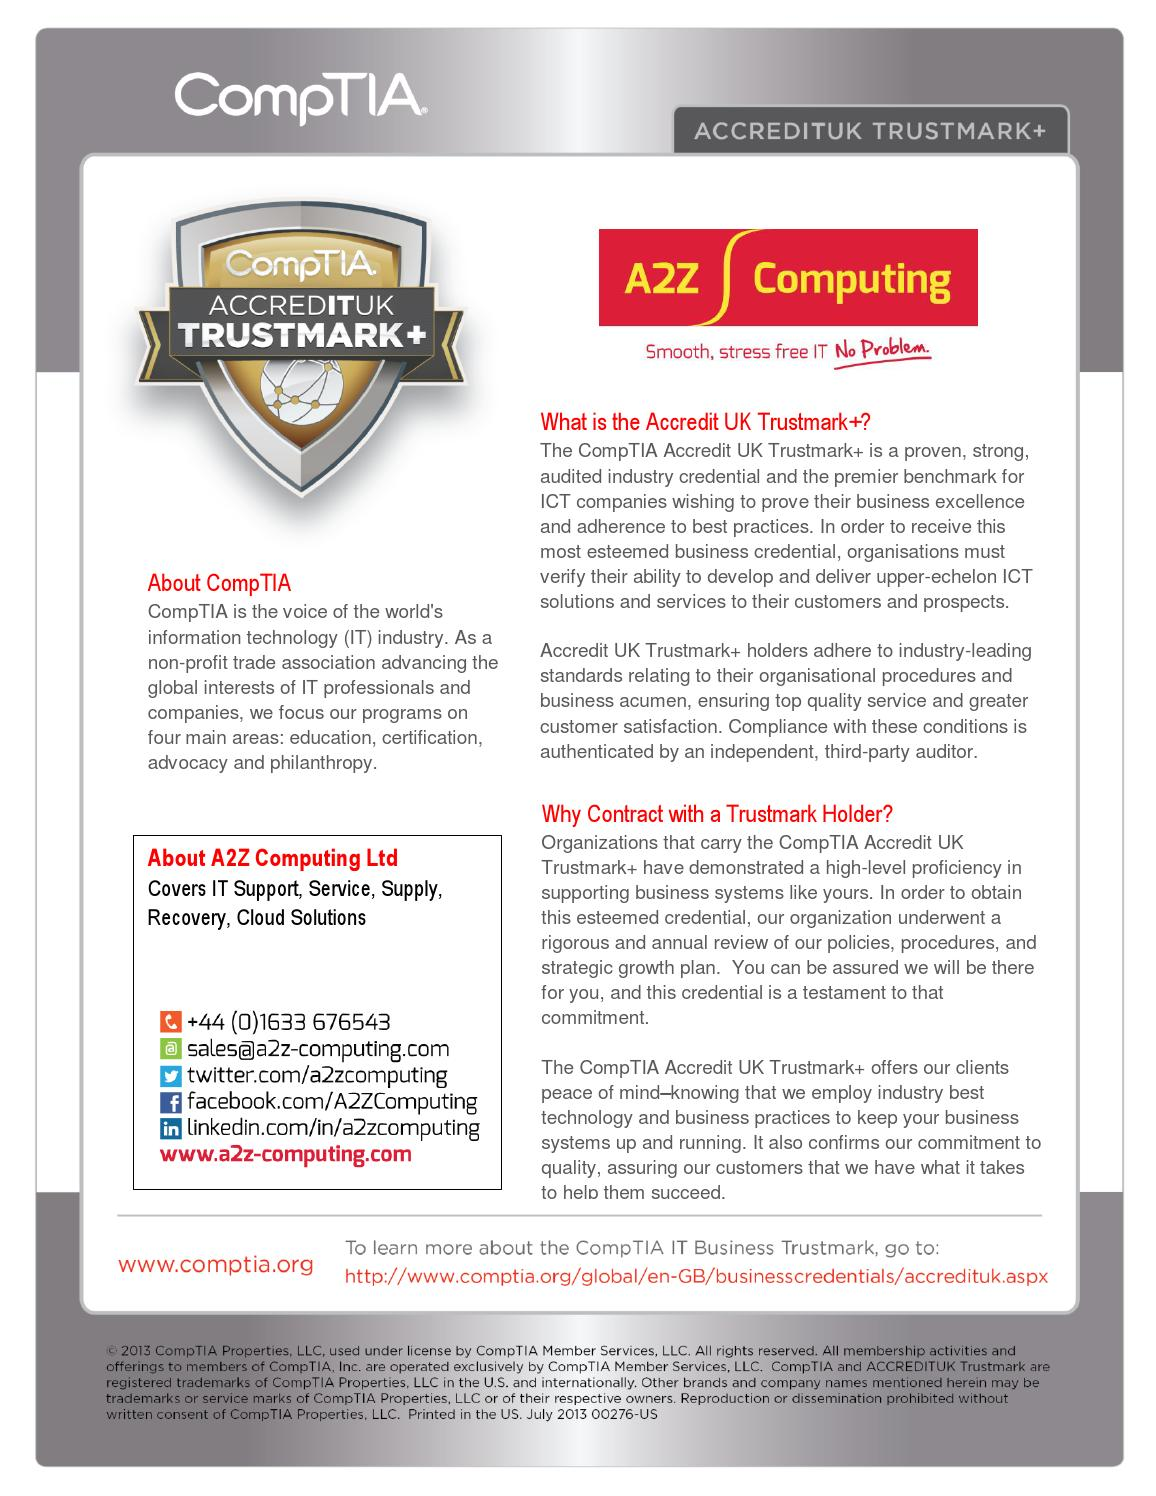 a2z accredit uk it business trustmark flyer by az ashraf issuu